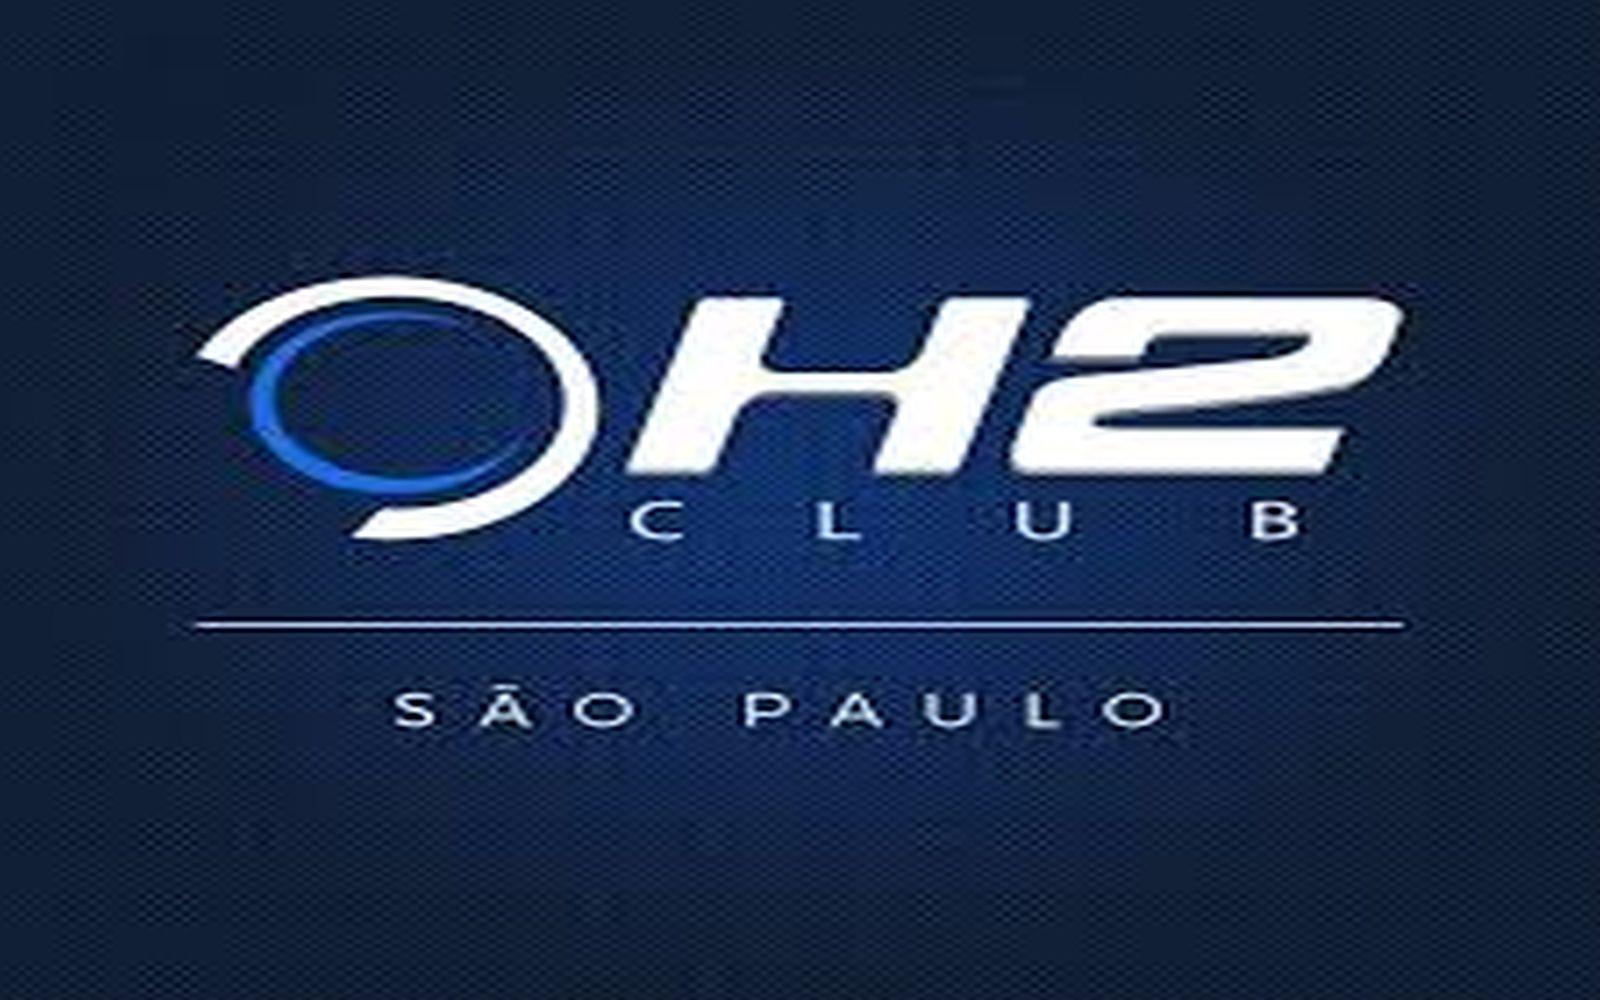 H2 Club Sao Paulo